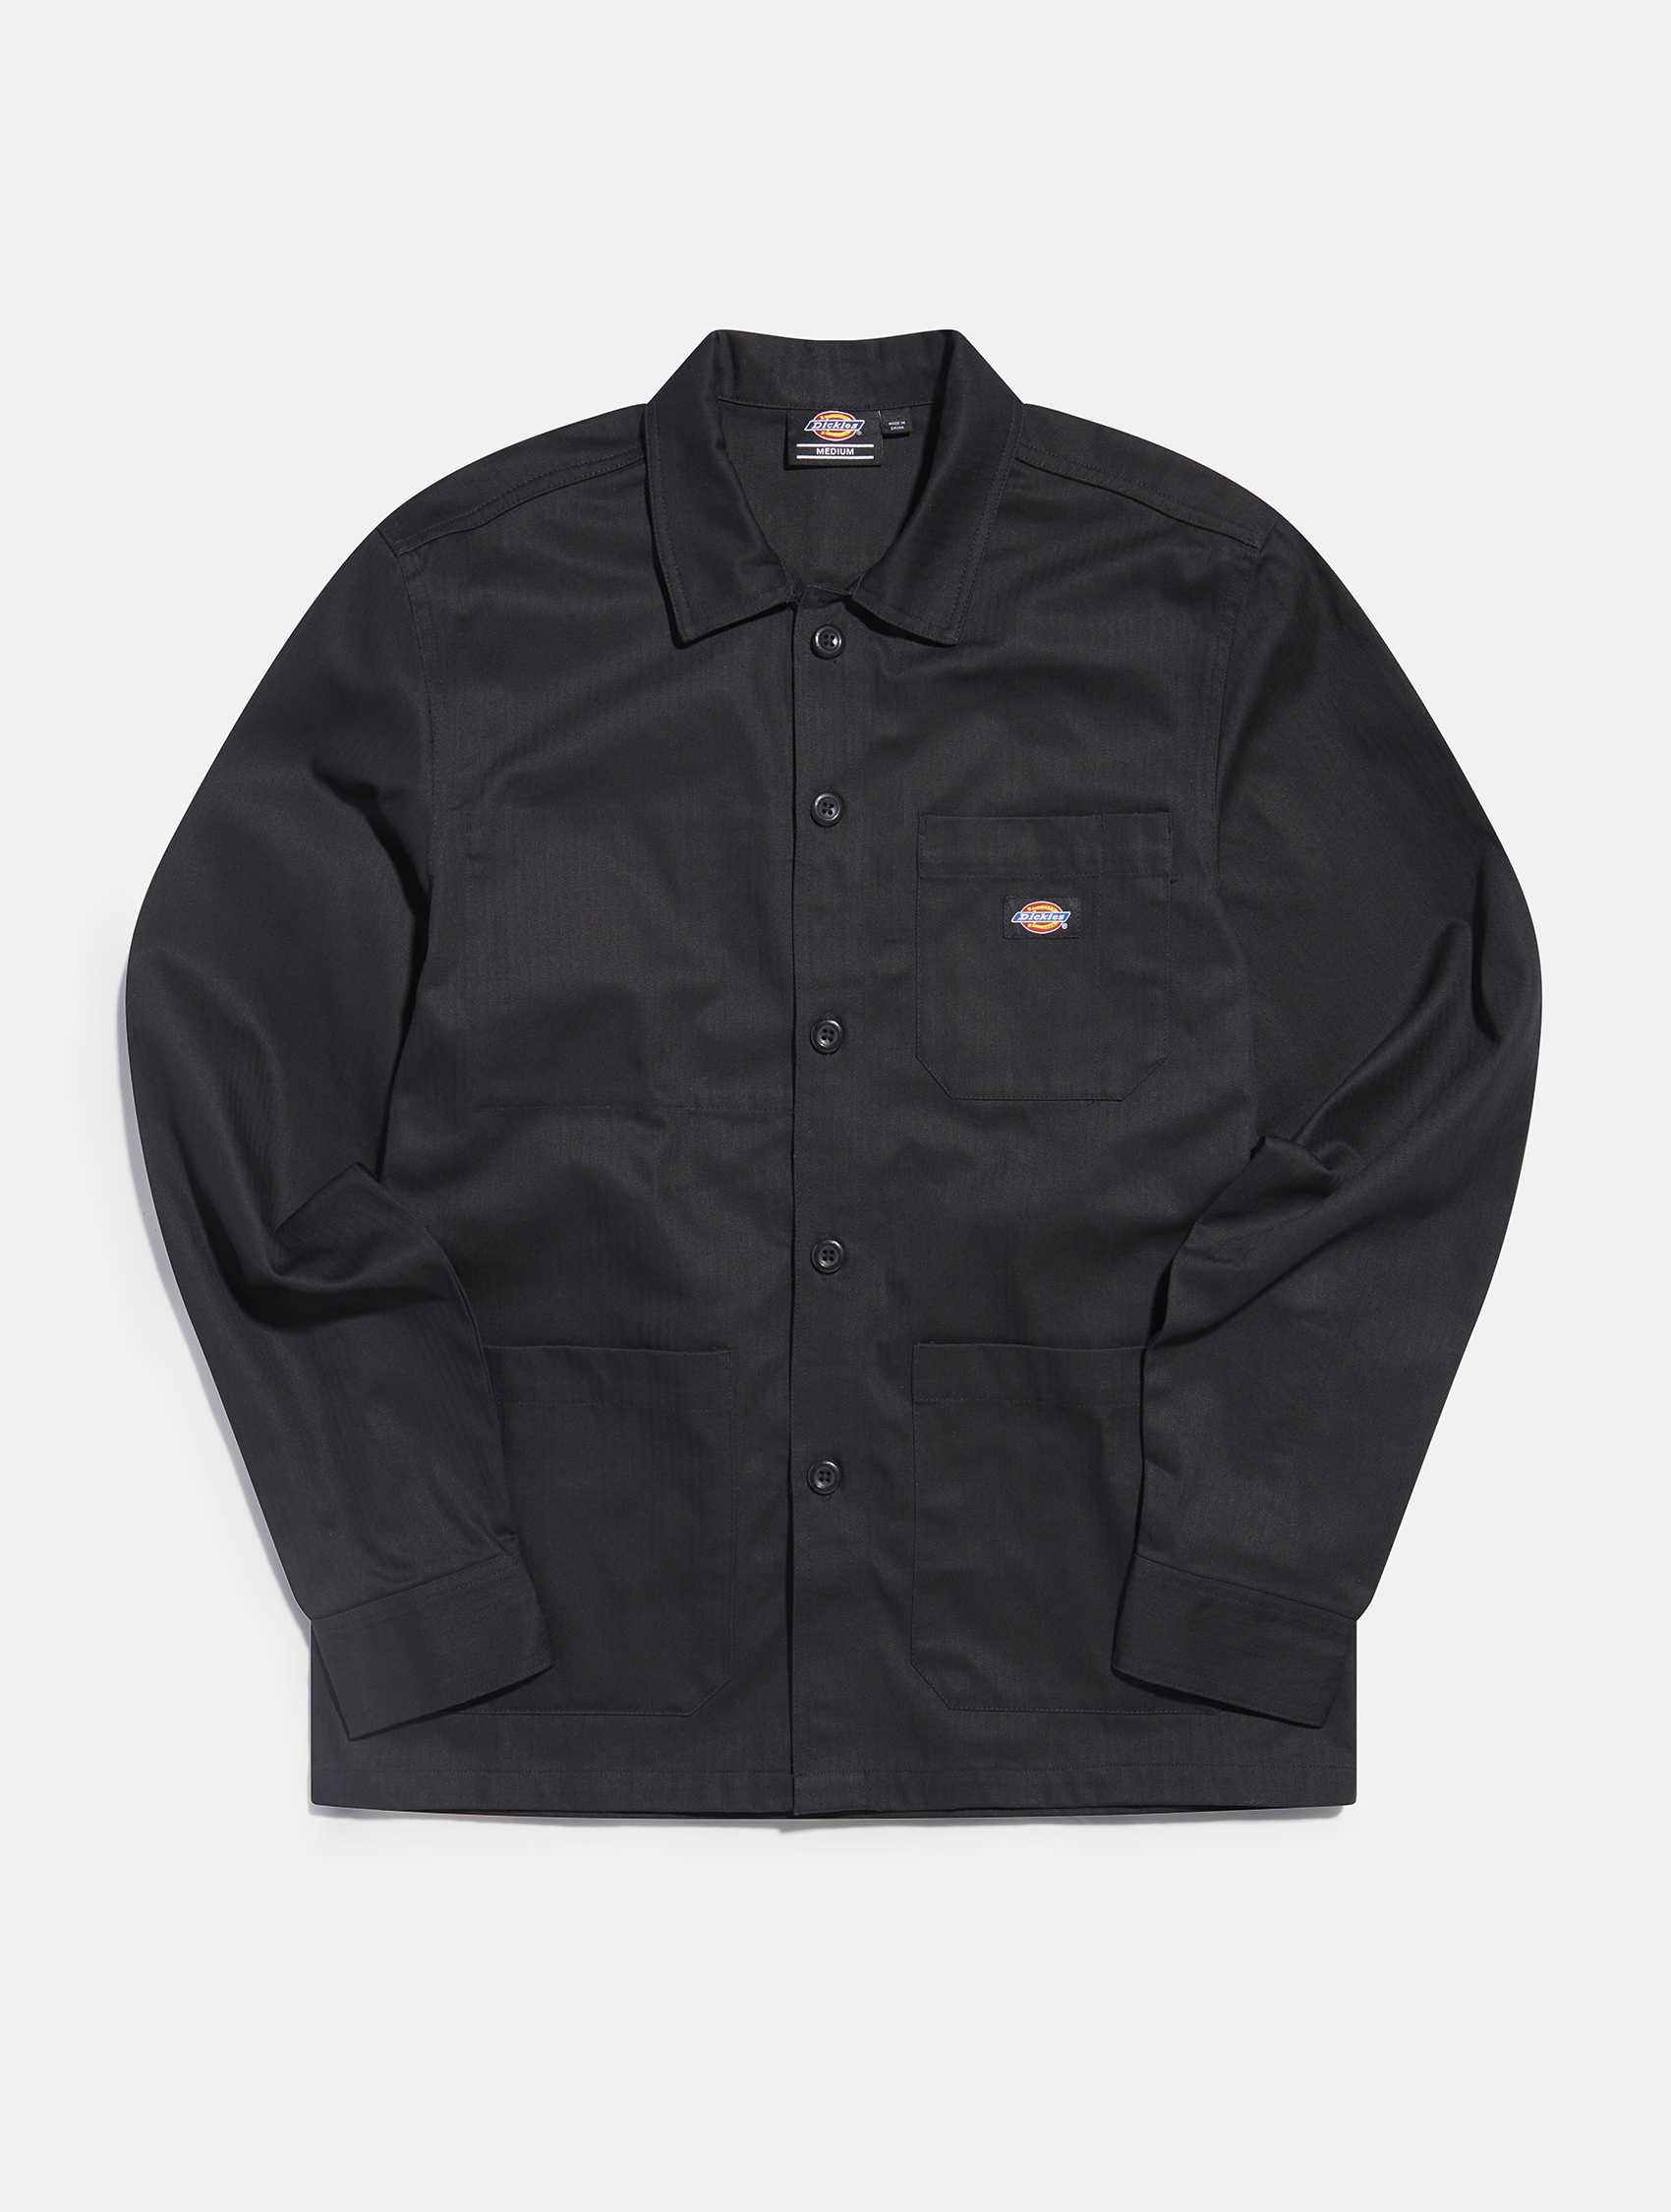 Dickies black denim long sleeve shirt